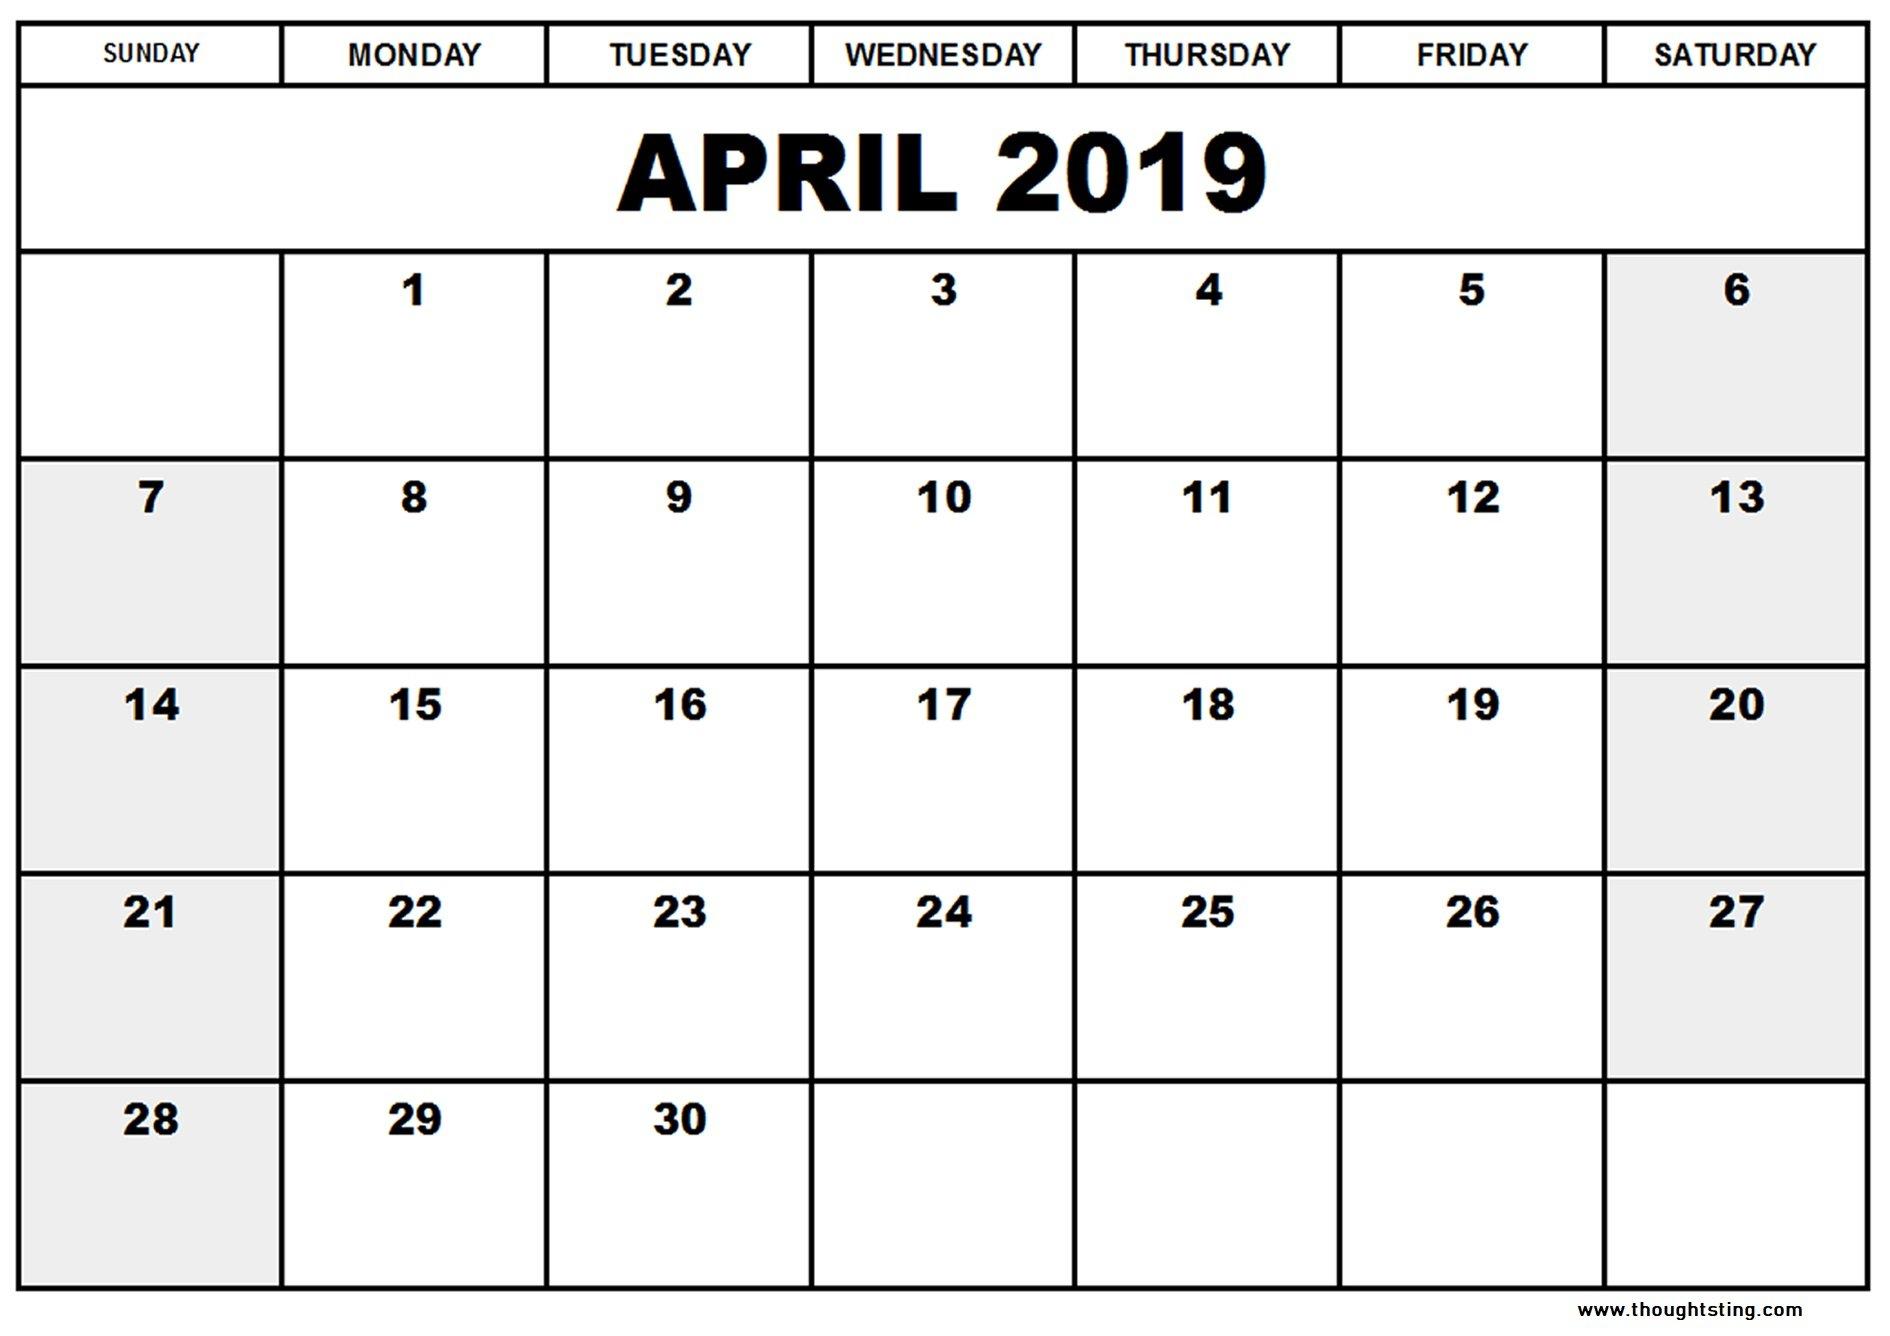 April 2019 Calendar Template Word, Excel, Pdf – Free Printable Calendar 2019 Template Pdf